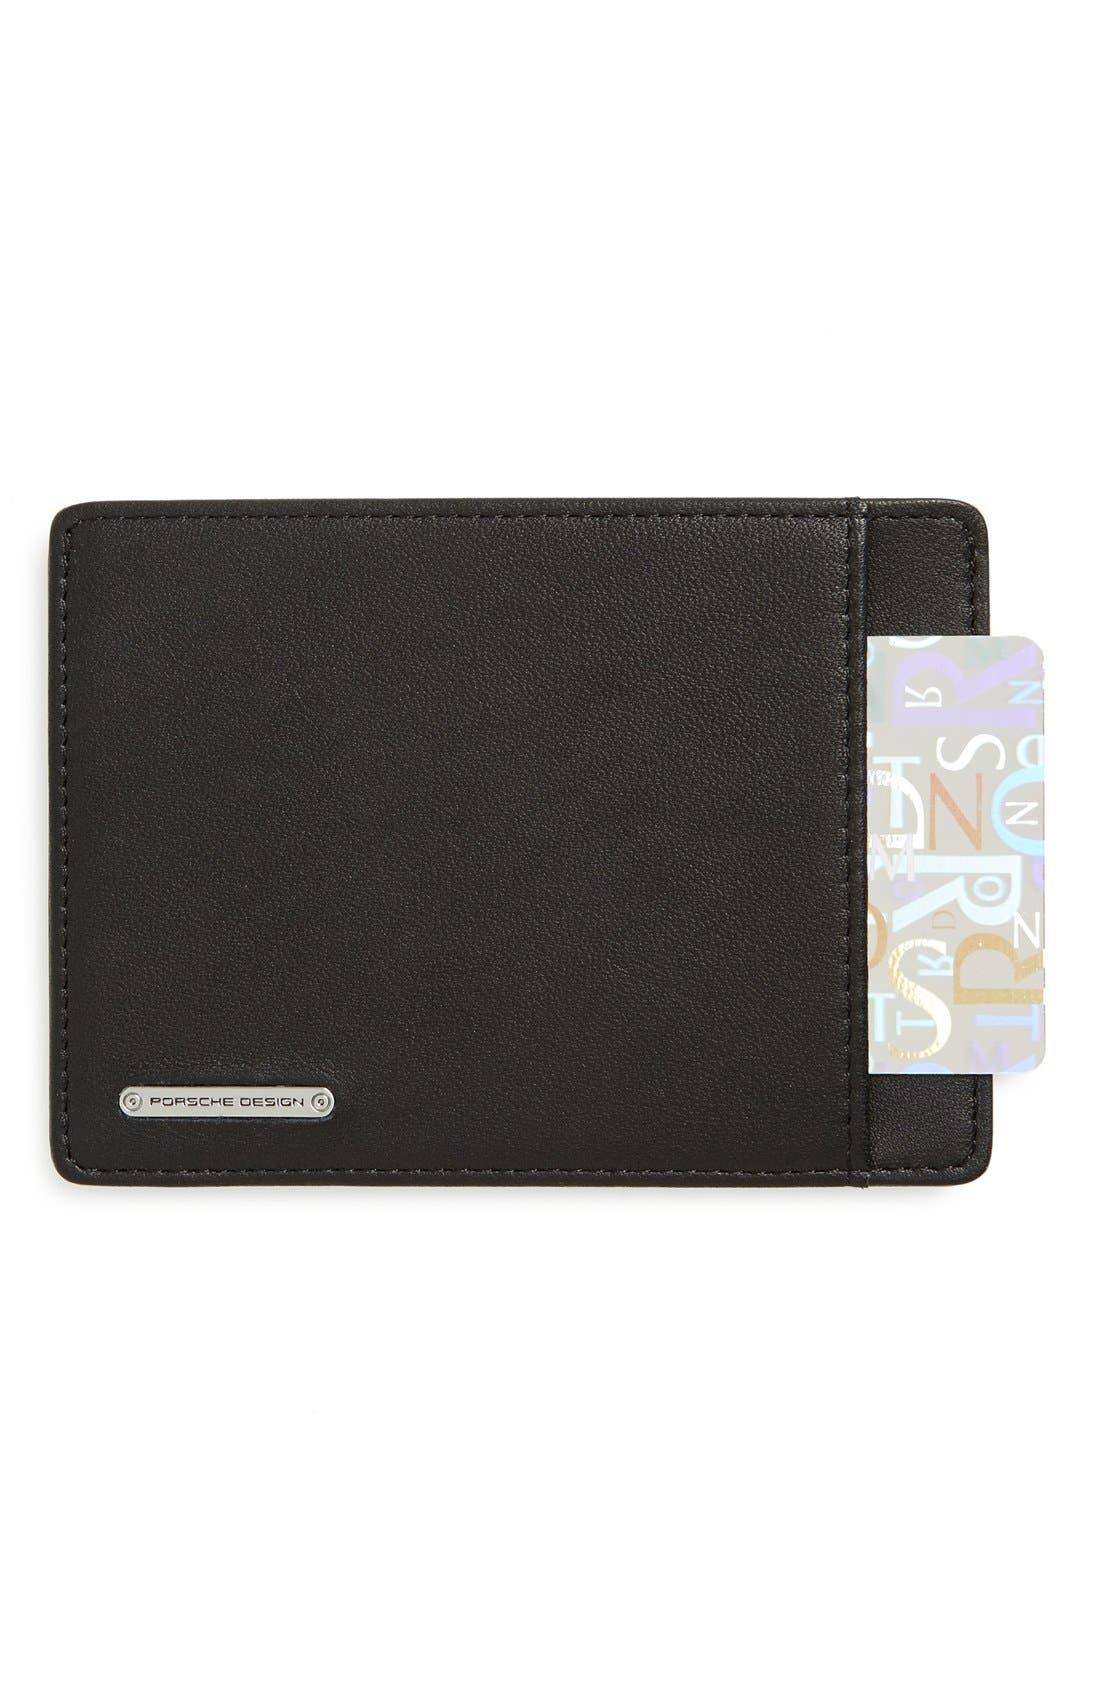 'CL2 2.0' Leather Card Holder,                         Main,                         color, Black